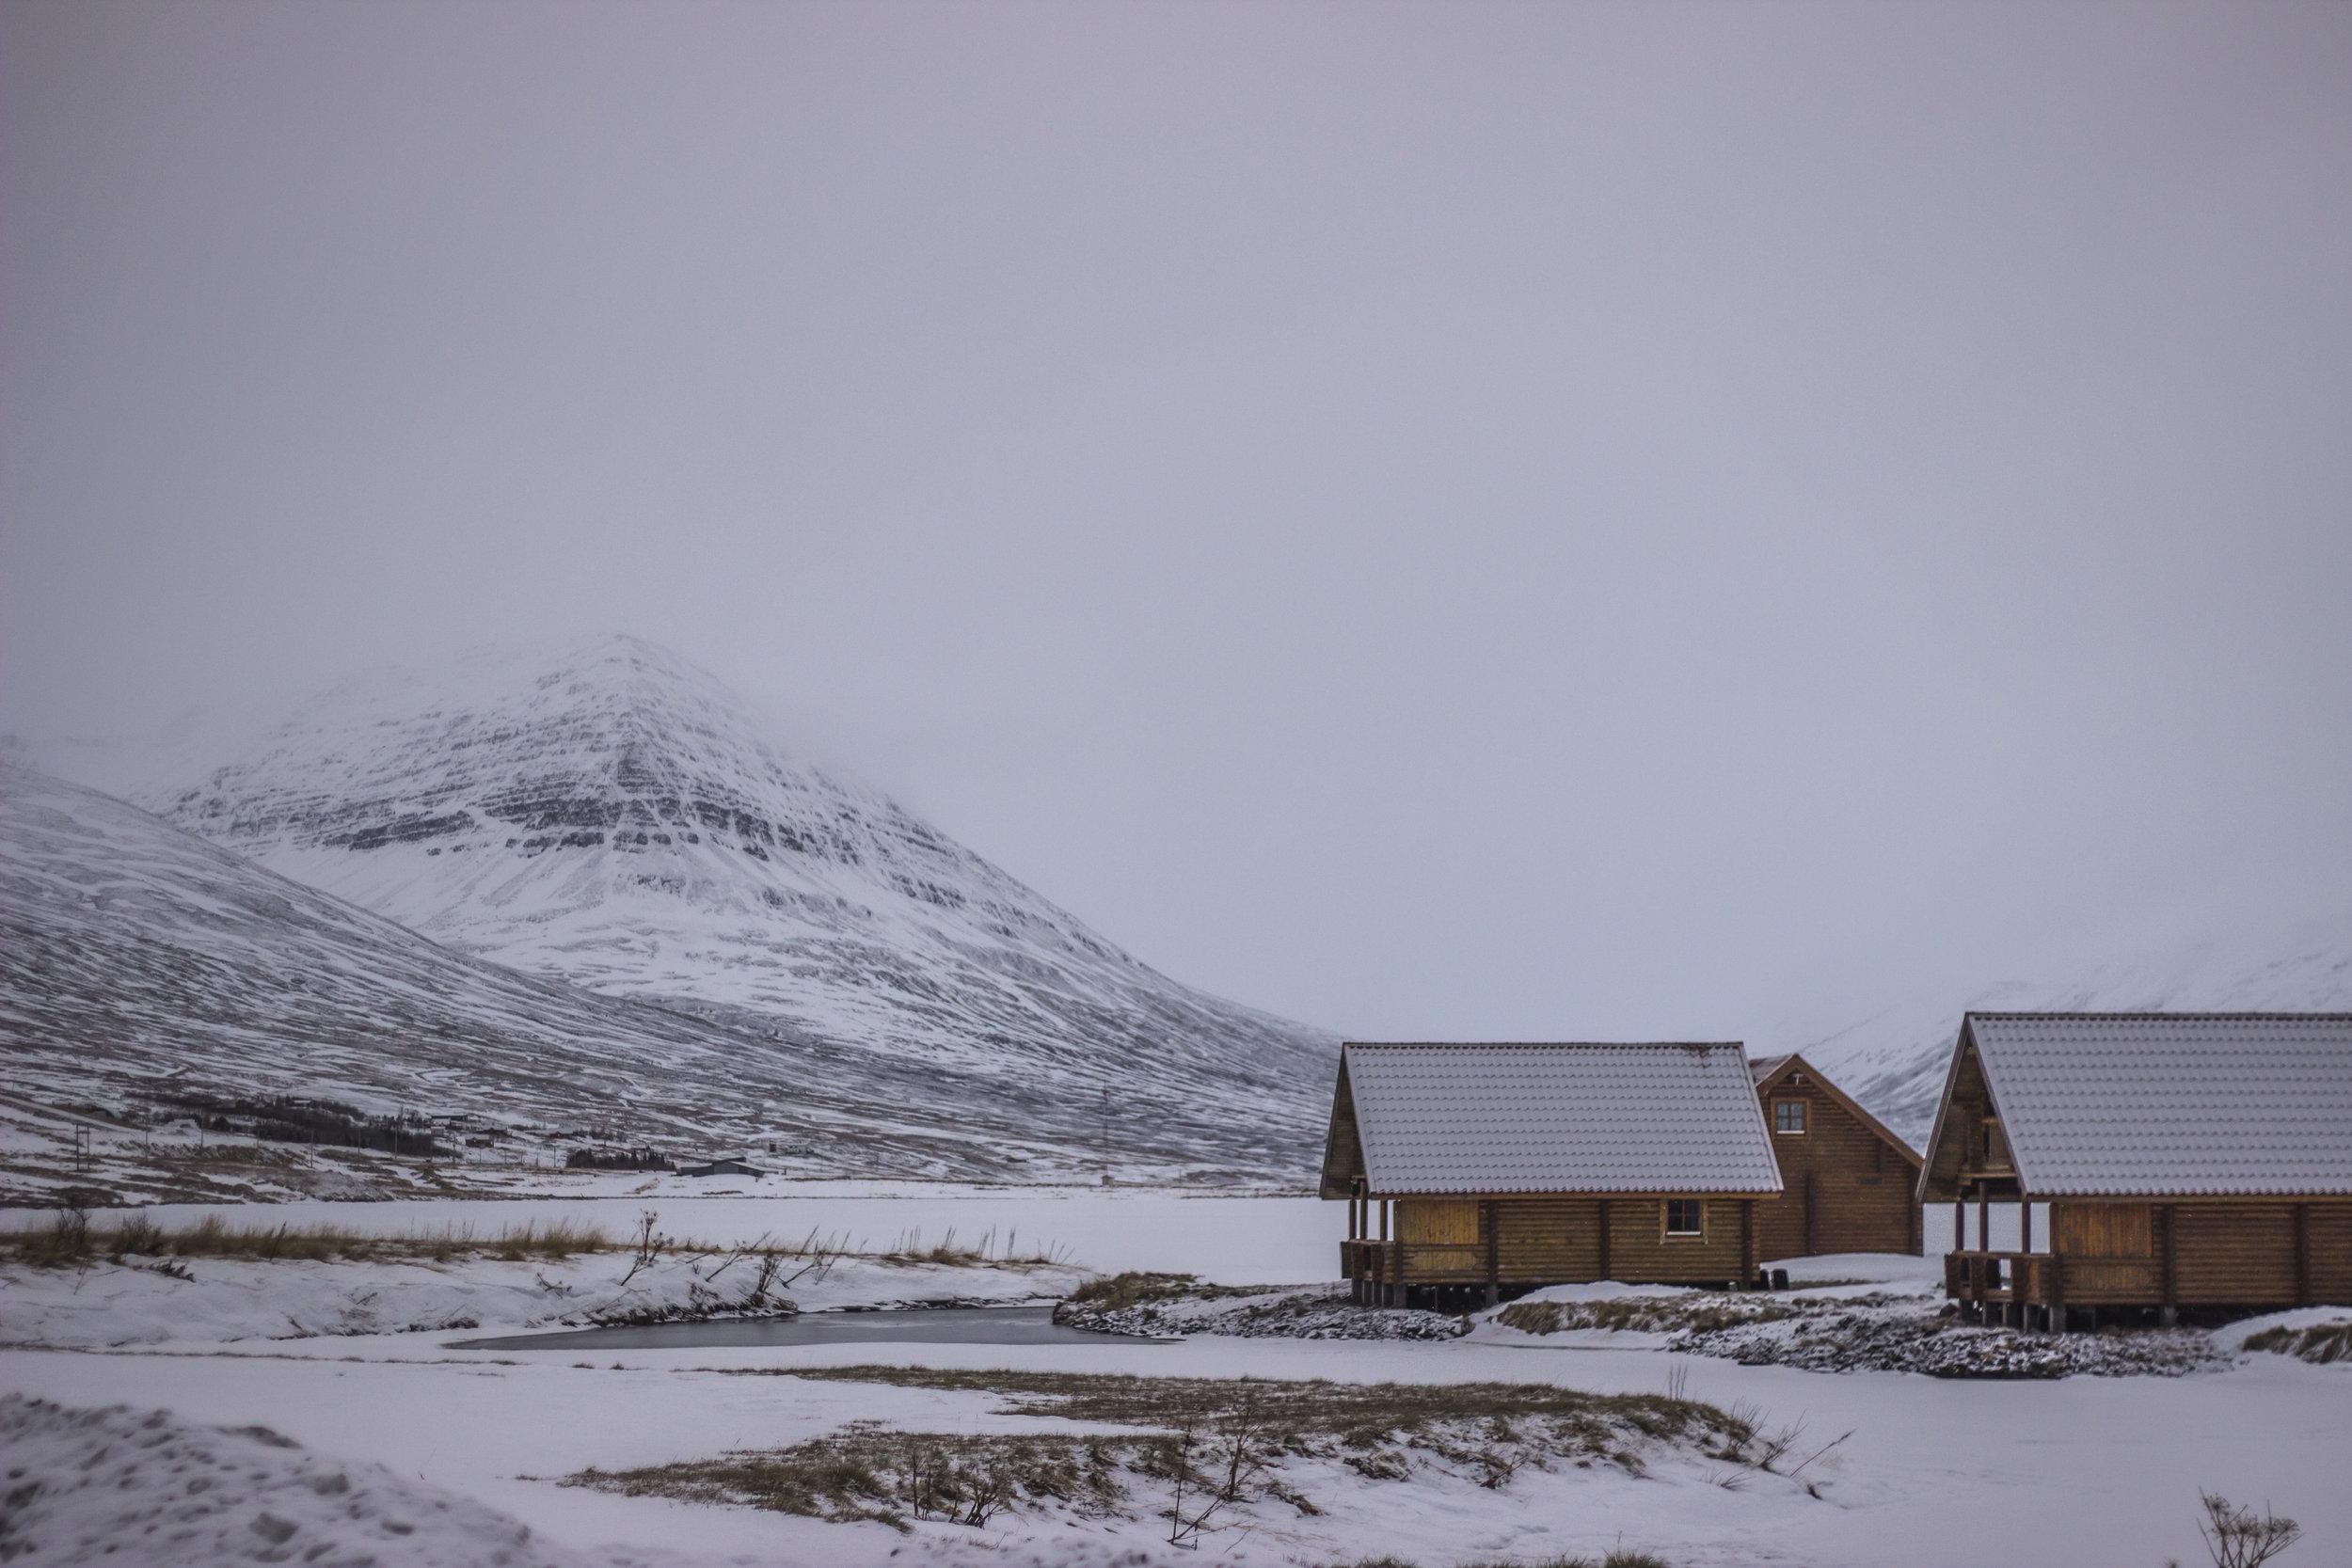 Summer cabins along Ólafsfjörður's frozen lake